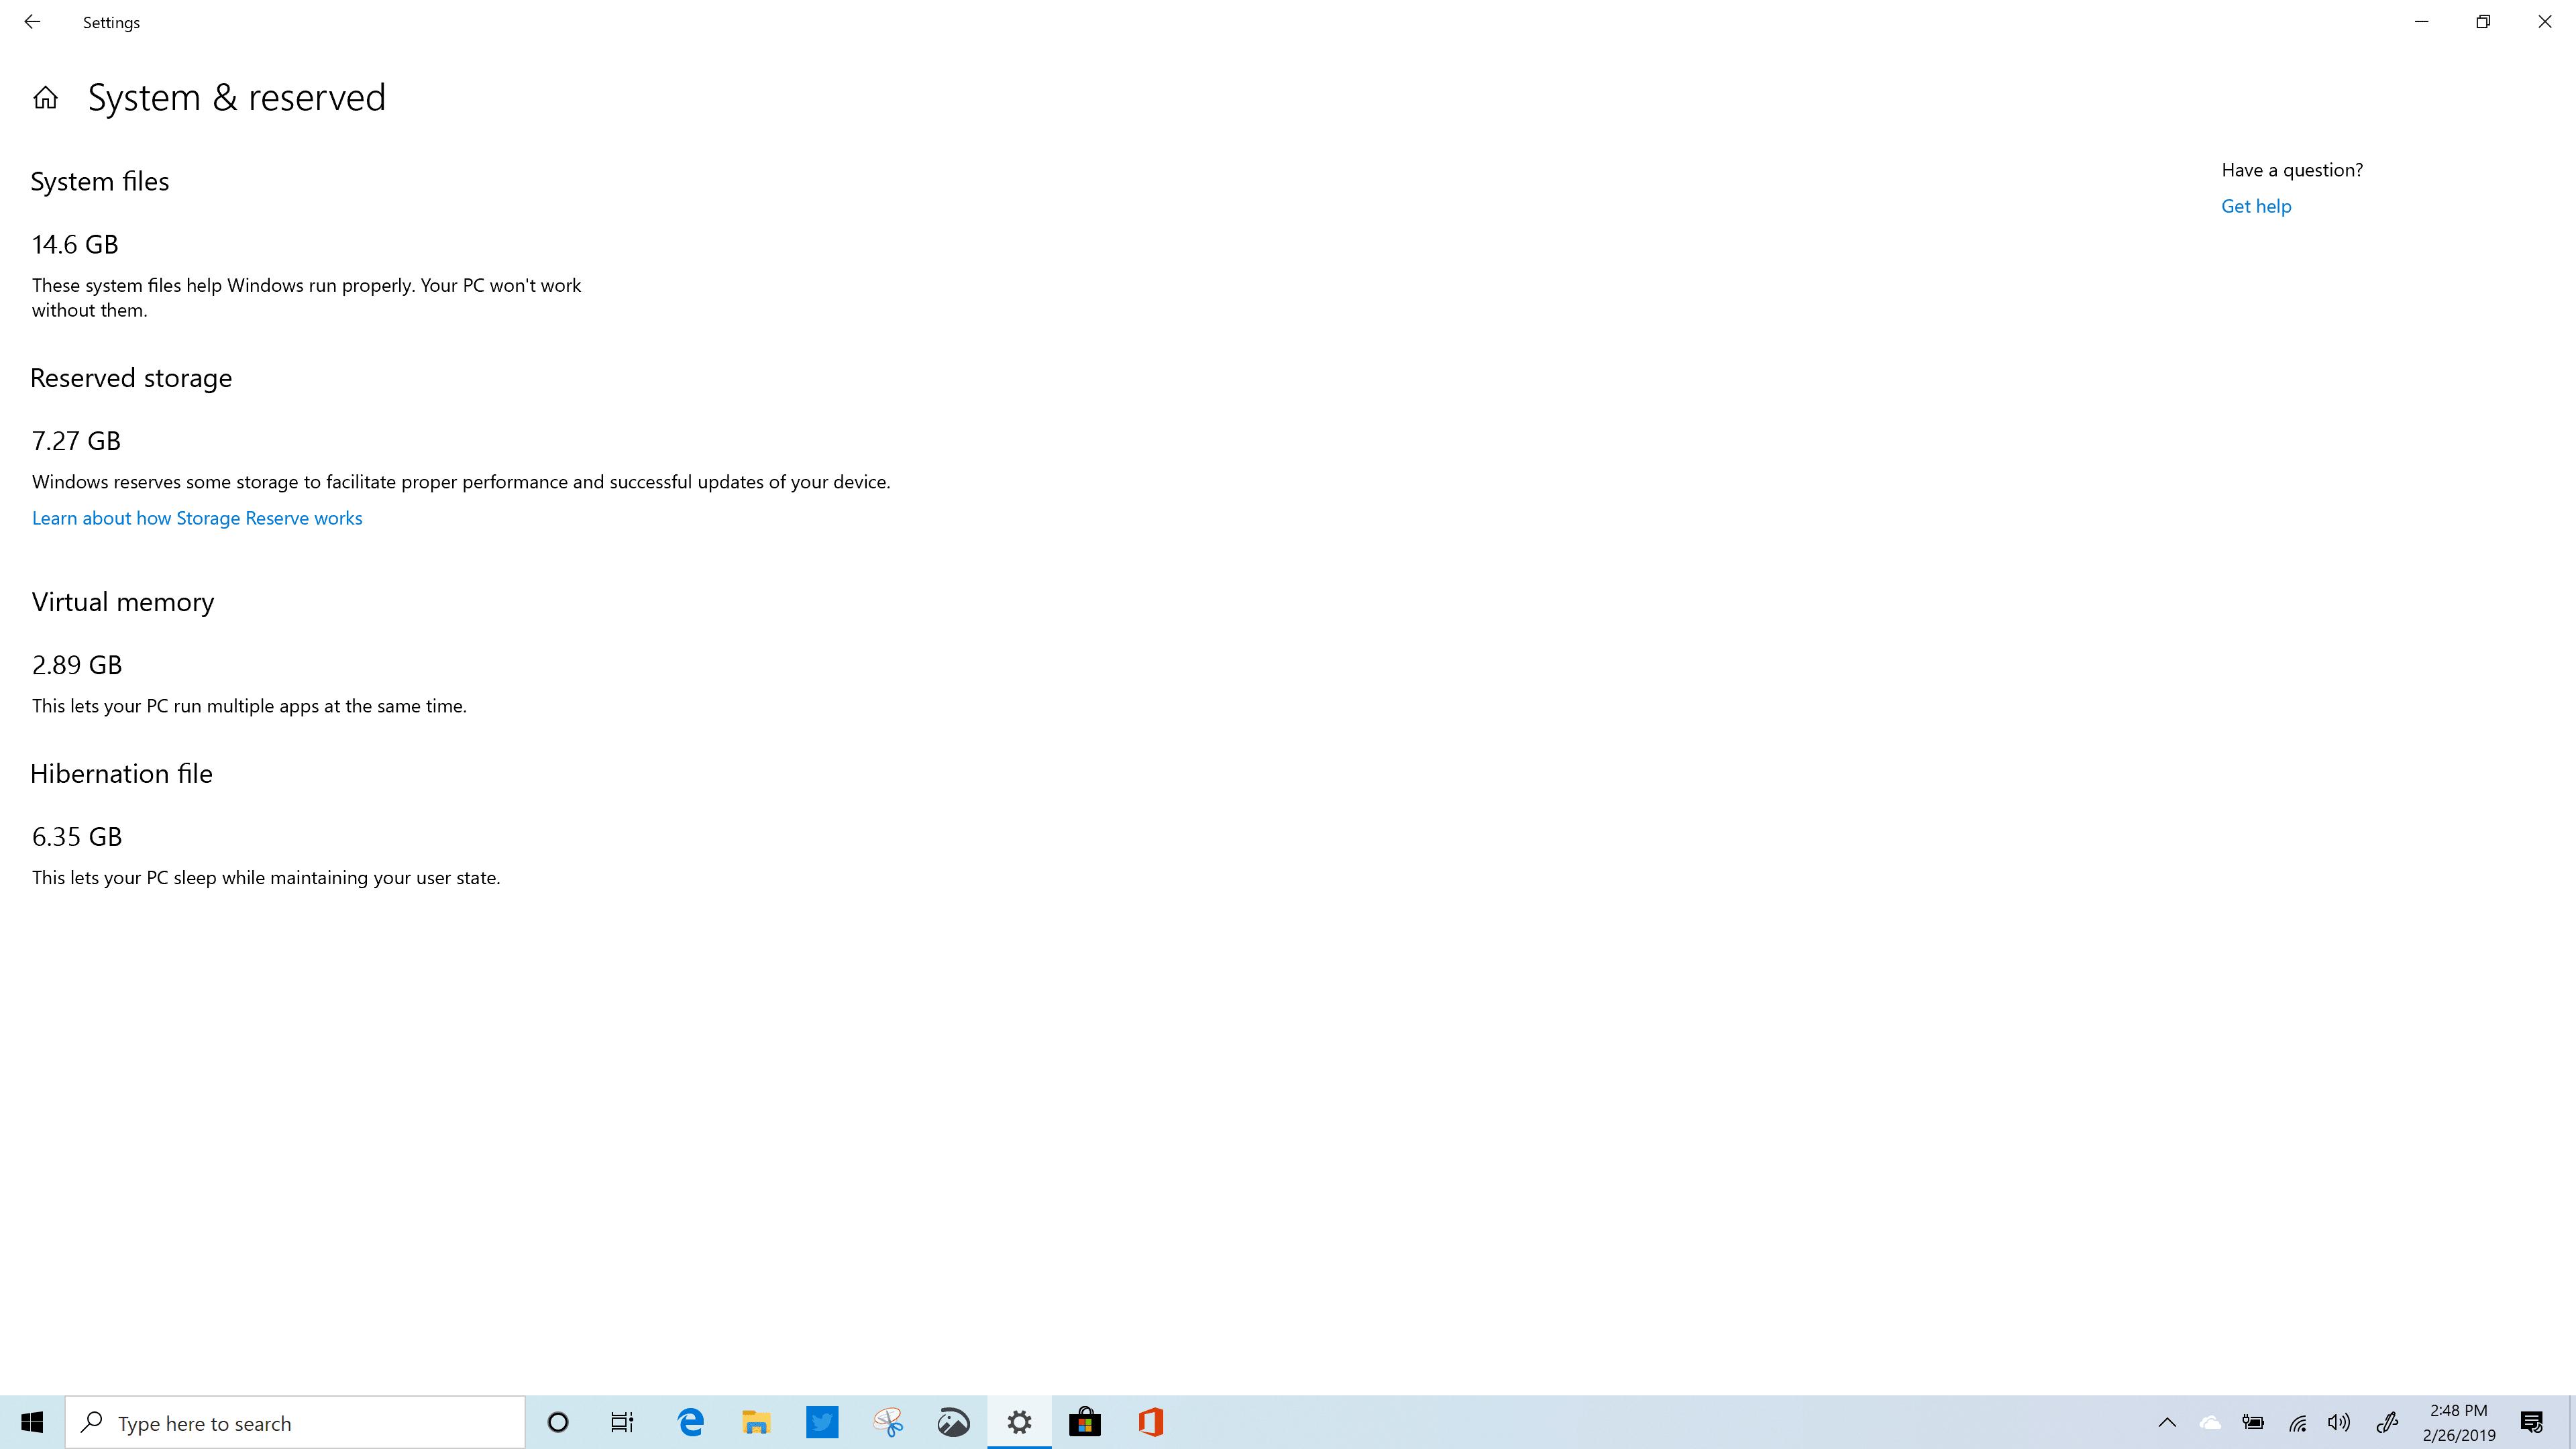 Windows 10 (19H1) Reserved Storage Usage - Build 18346 - HP Spectre x360